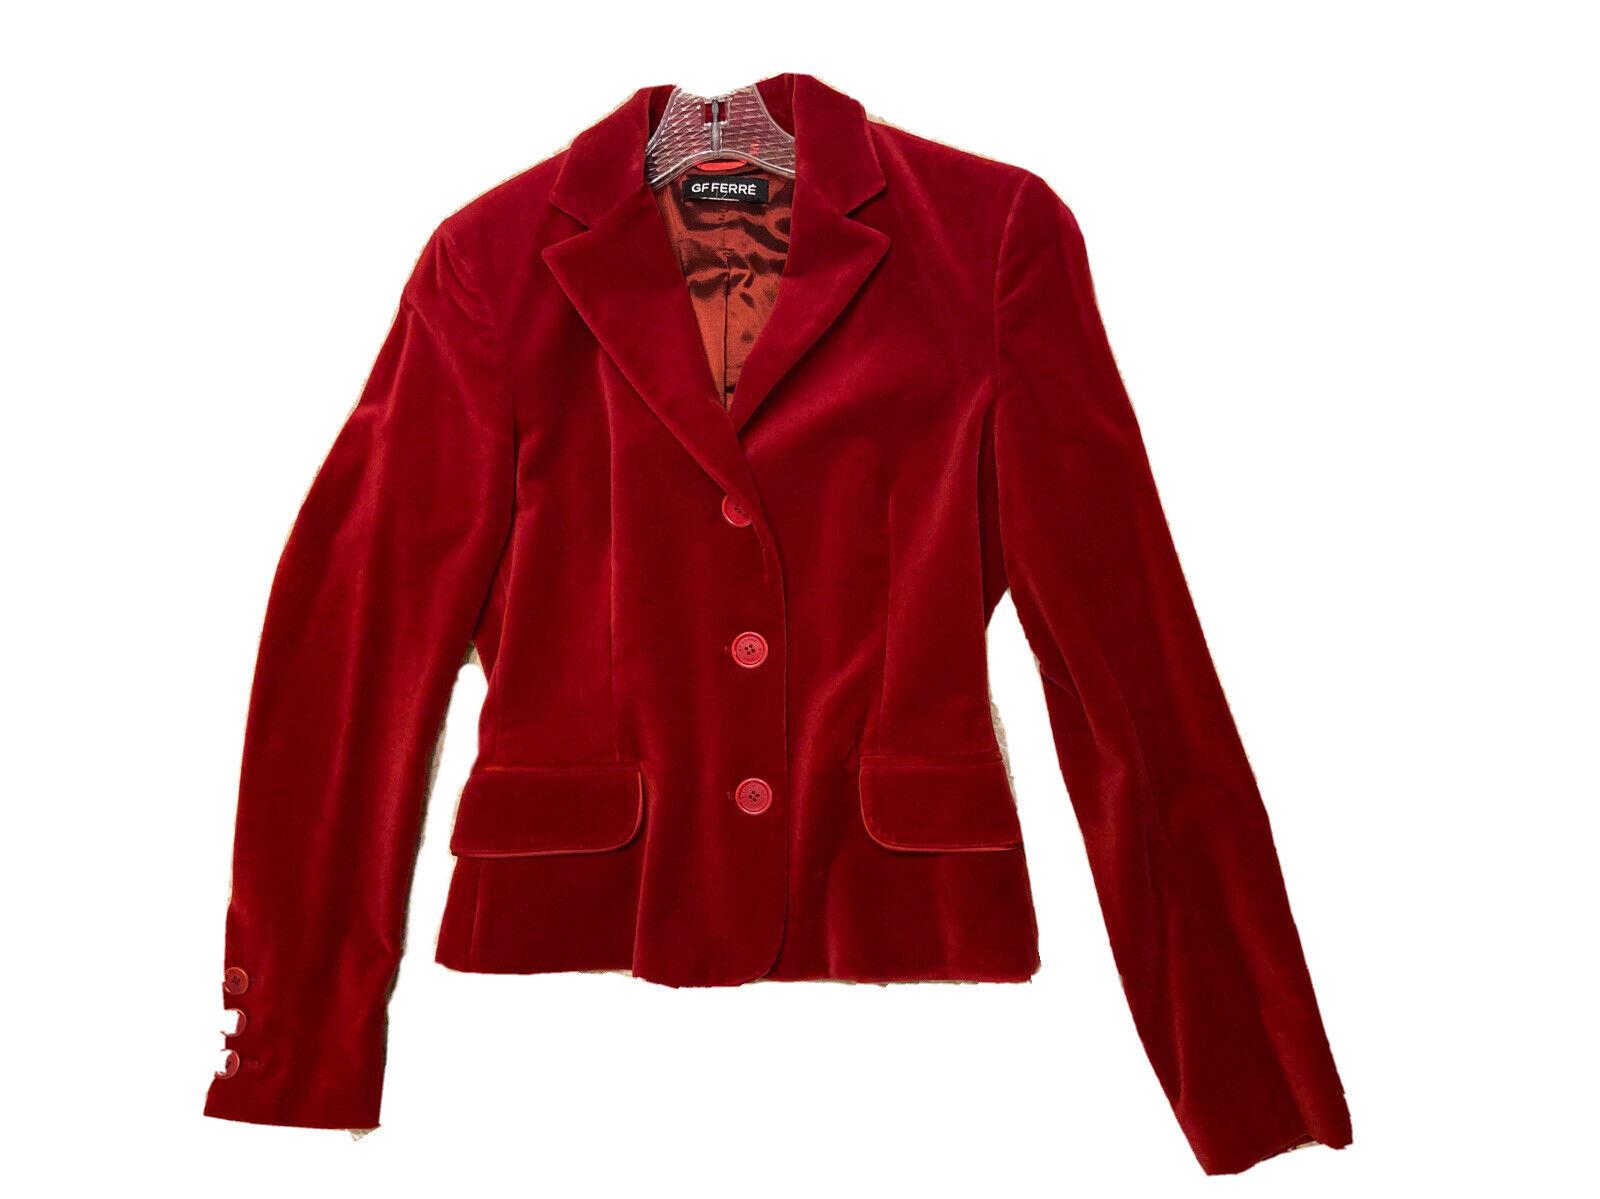 GF FERRE Vintage Red Velvet Velour Jacket Blazer … - image 5